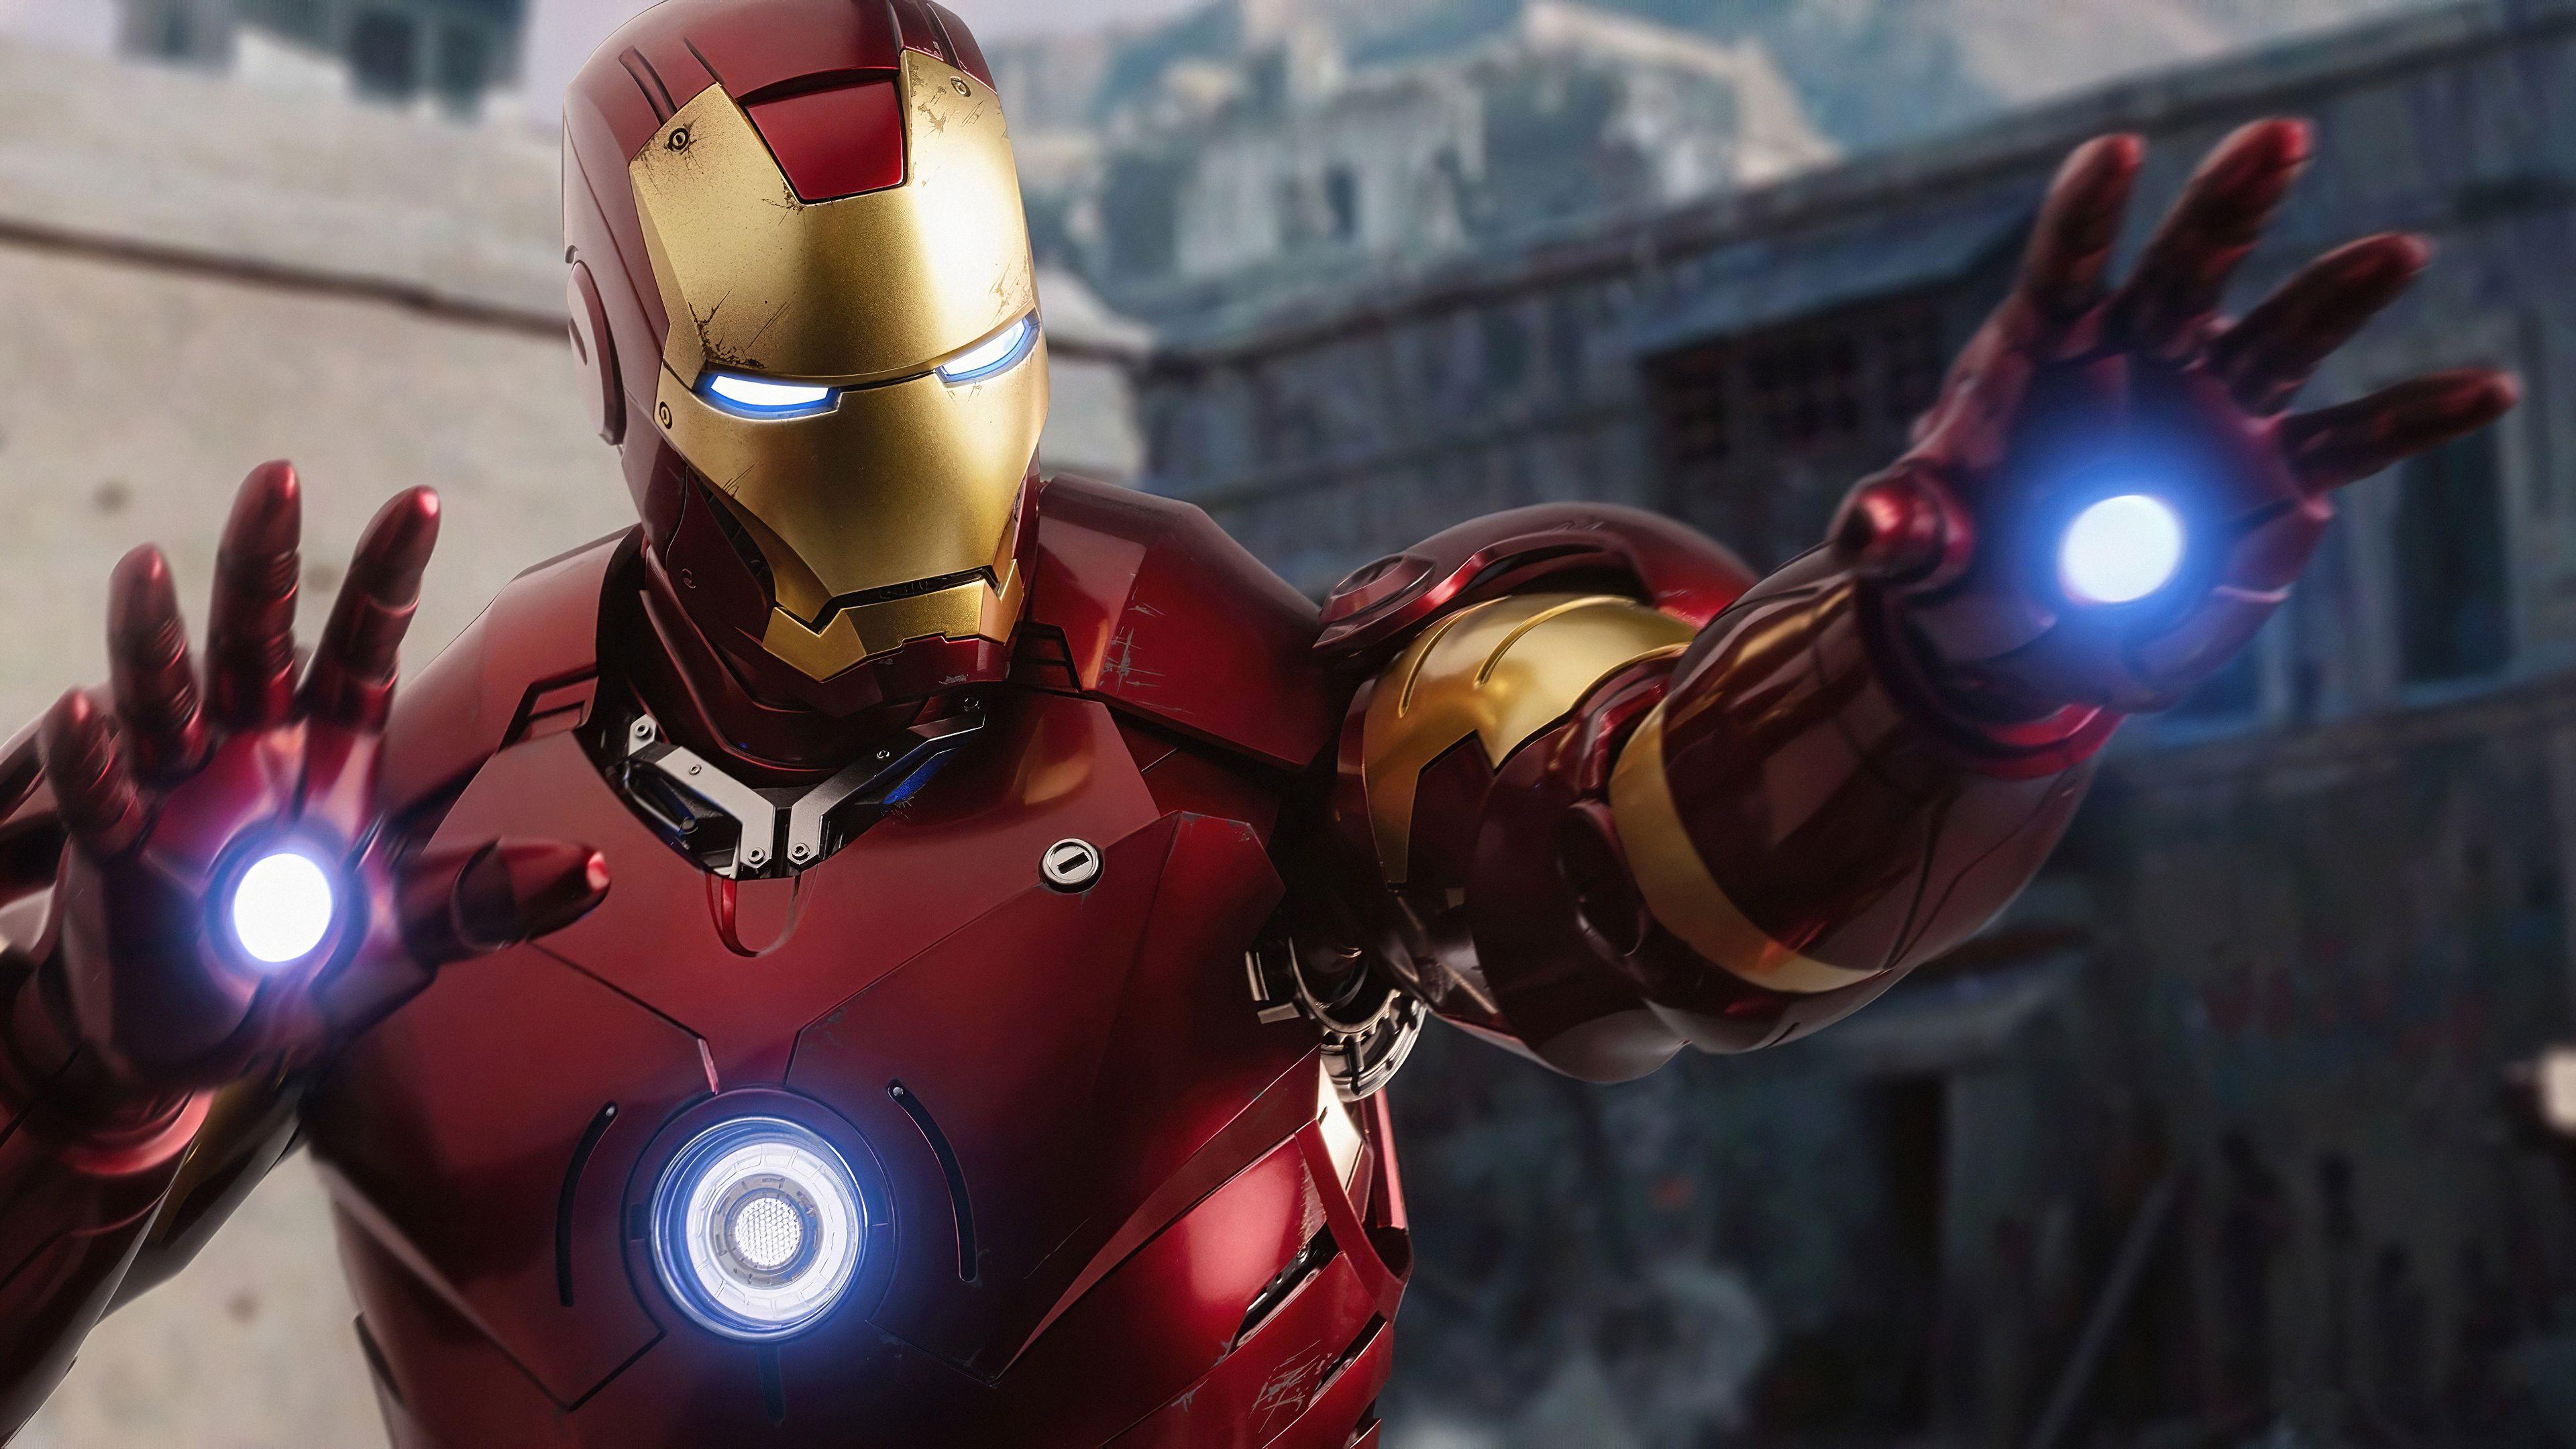 Iron Man Ready For Fight Iron Man Phone Wallpaper 4k Iron Man Hd Wallpaper Iron Man 4k Wallpaper Iron Man Hd Wallpaper Iron Man Iron Man 4k